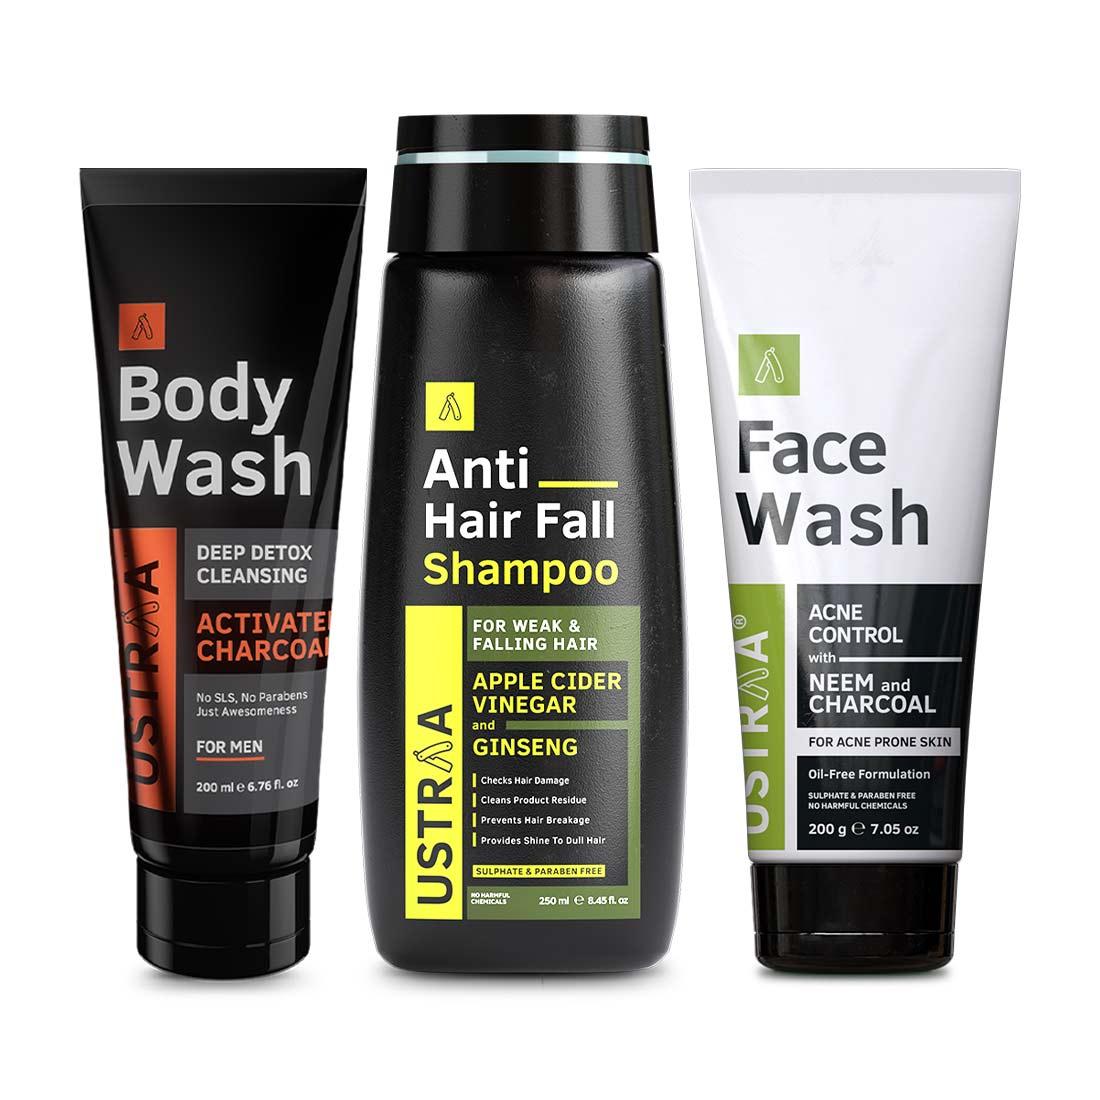 Ustraa | Ustraa Face Wash Neem & Charcoal 200 g, Body Wash - Activated Charcoal 200 ml & Anti Hair Fall Shampoo 250 g